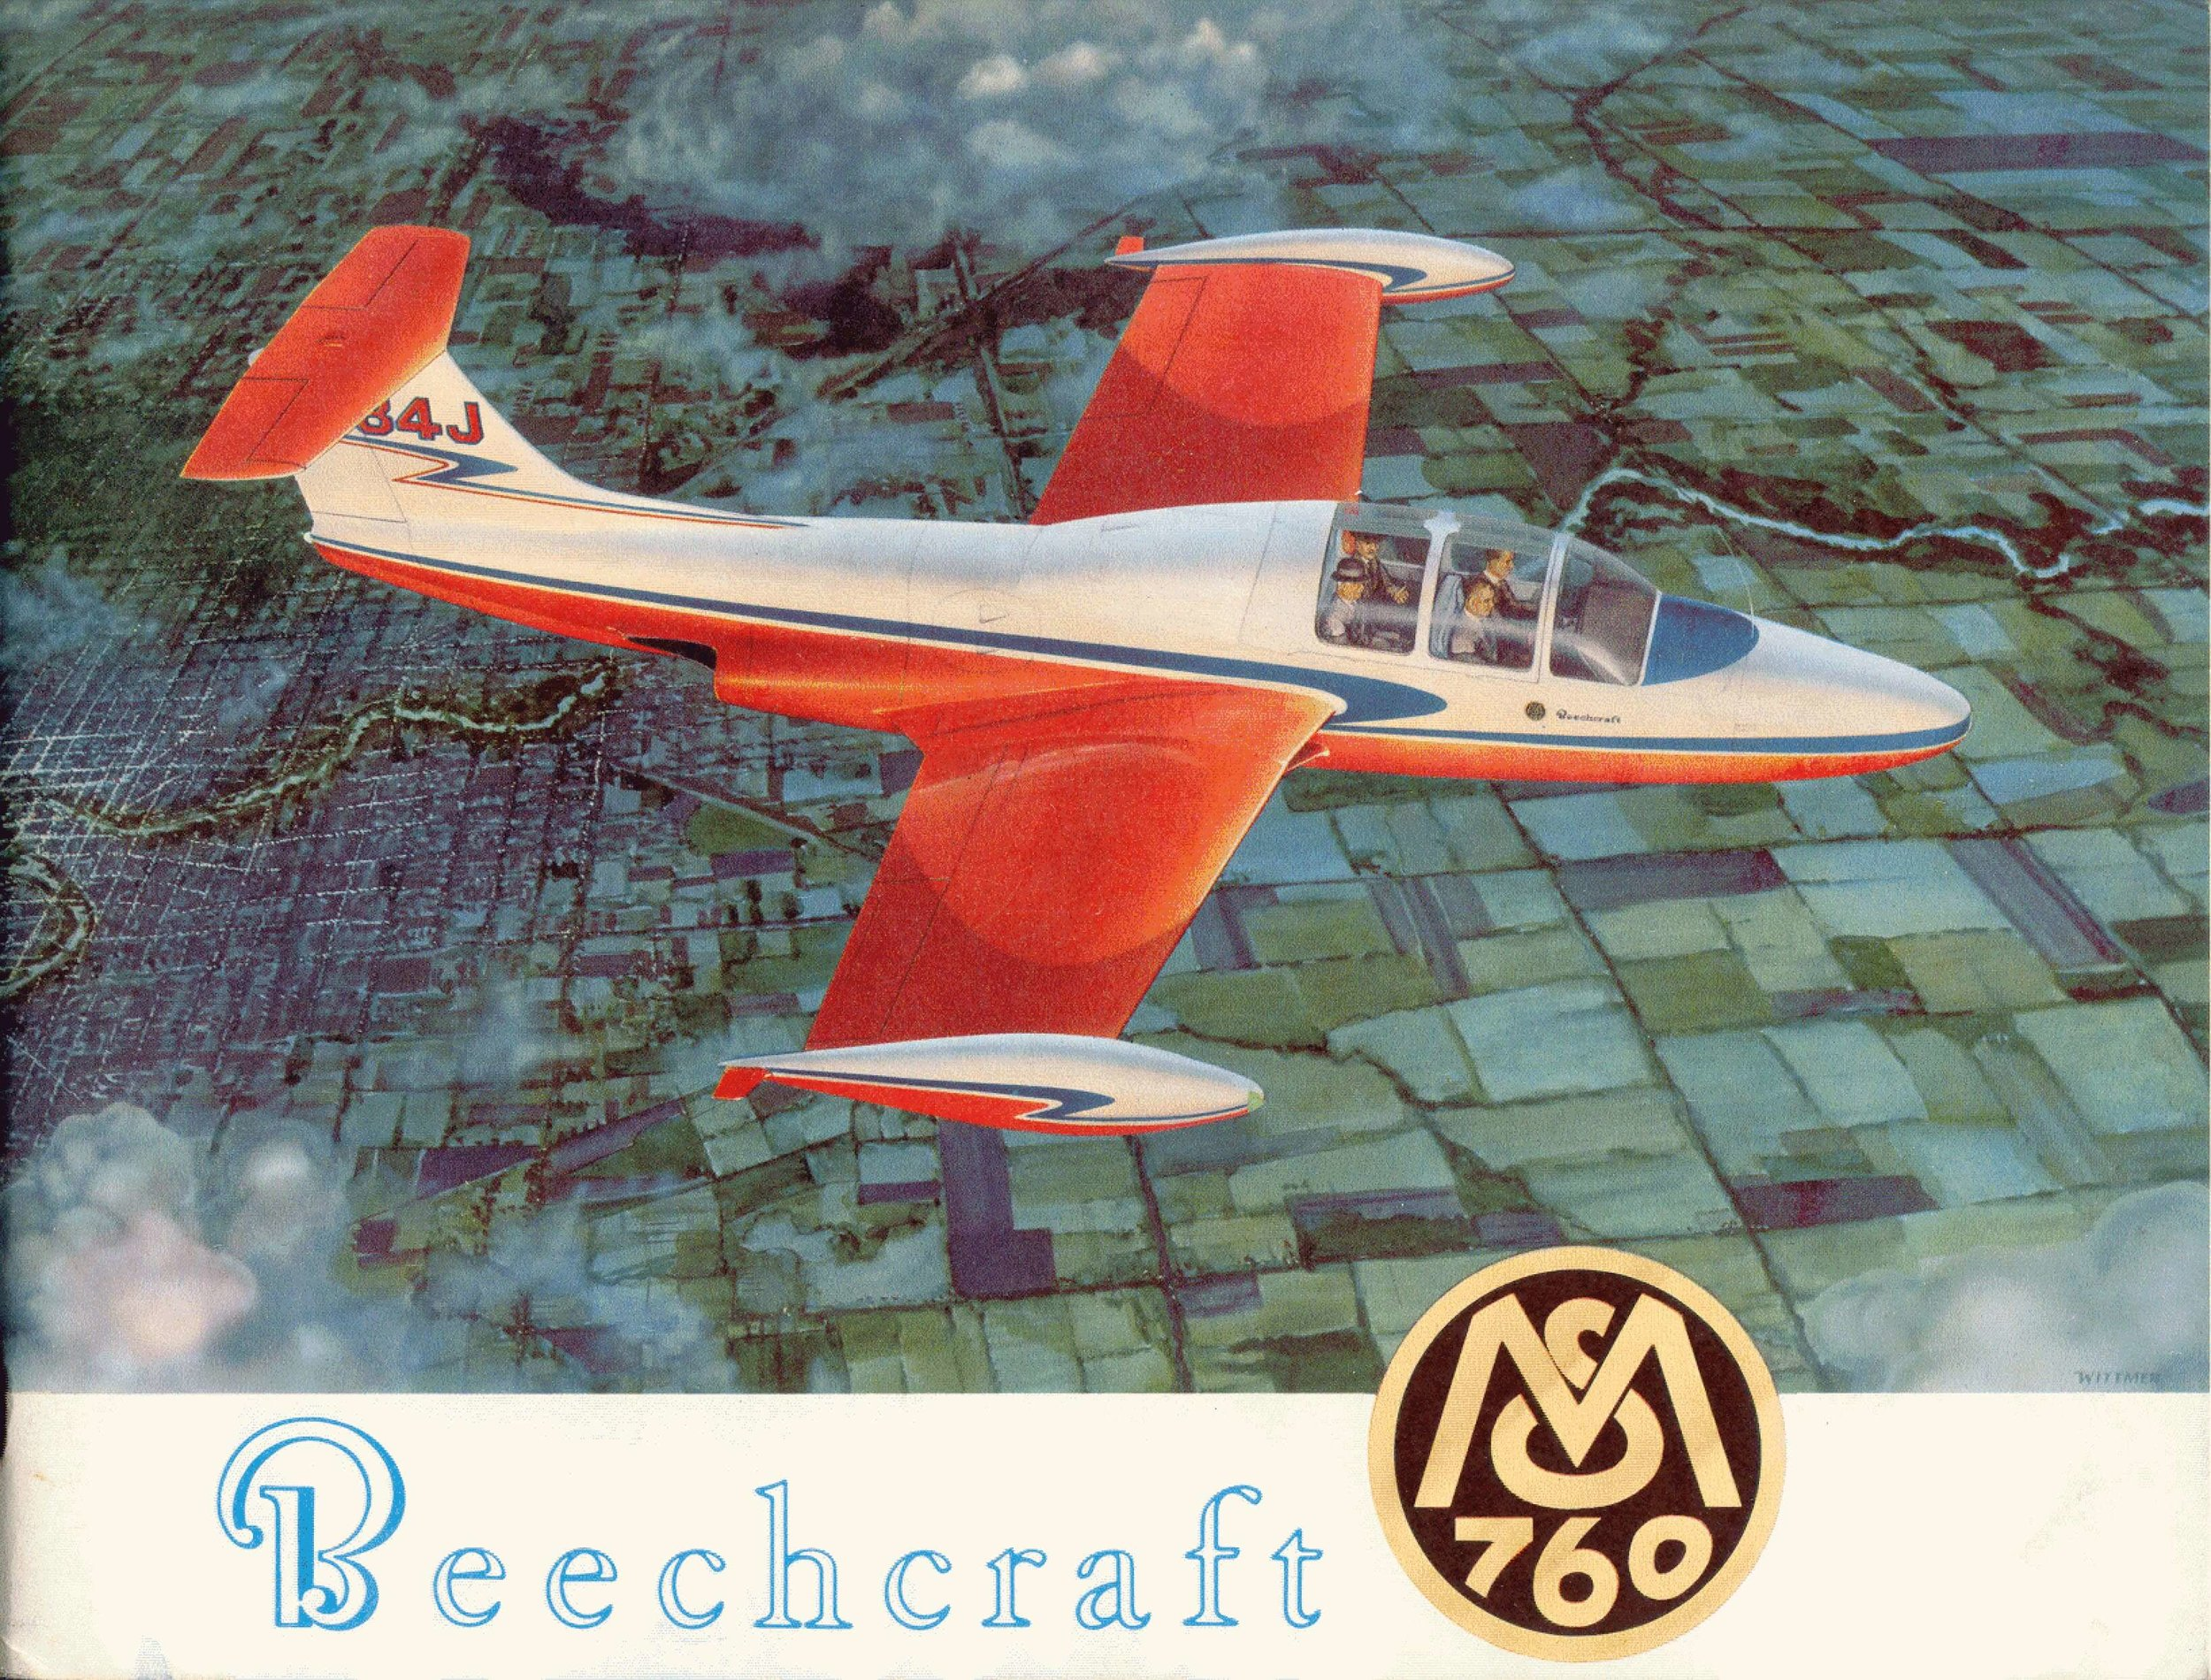 N84J in a Beechcraft ad.